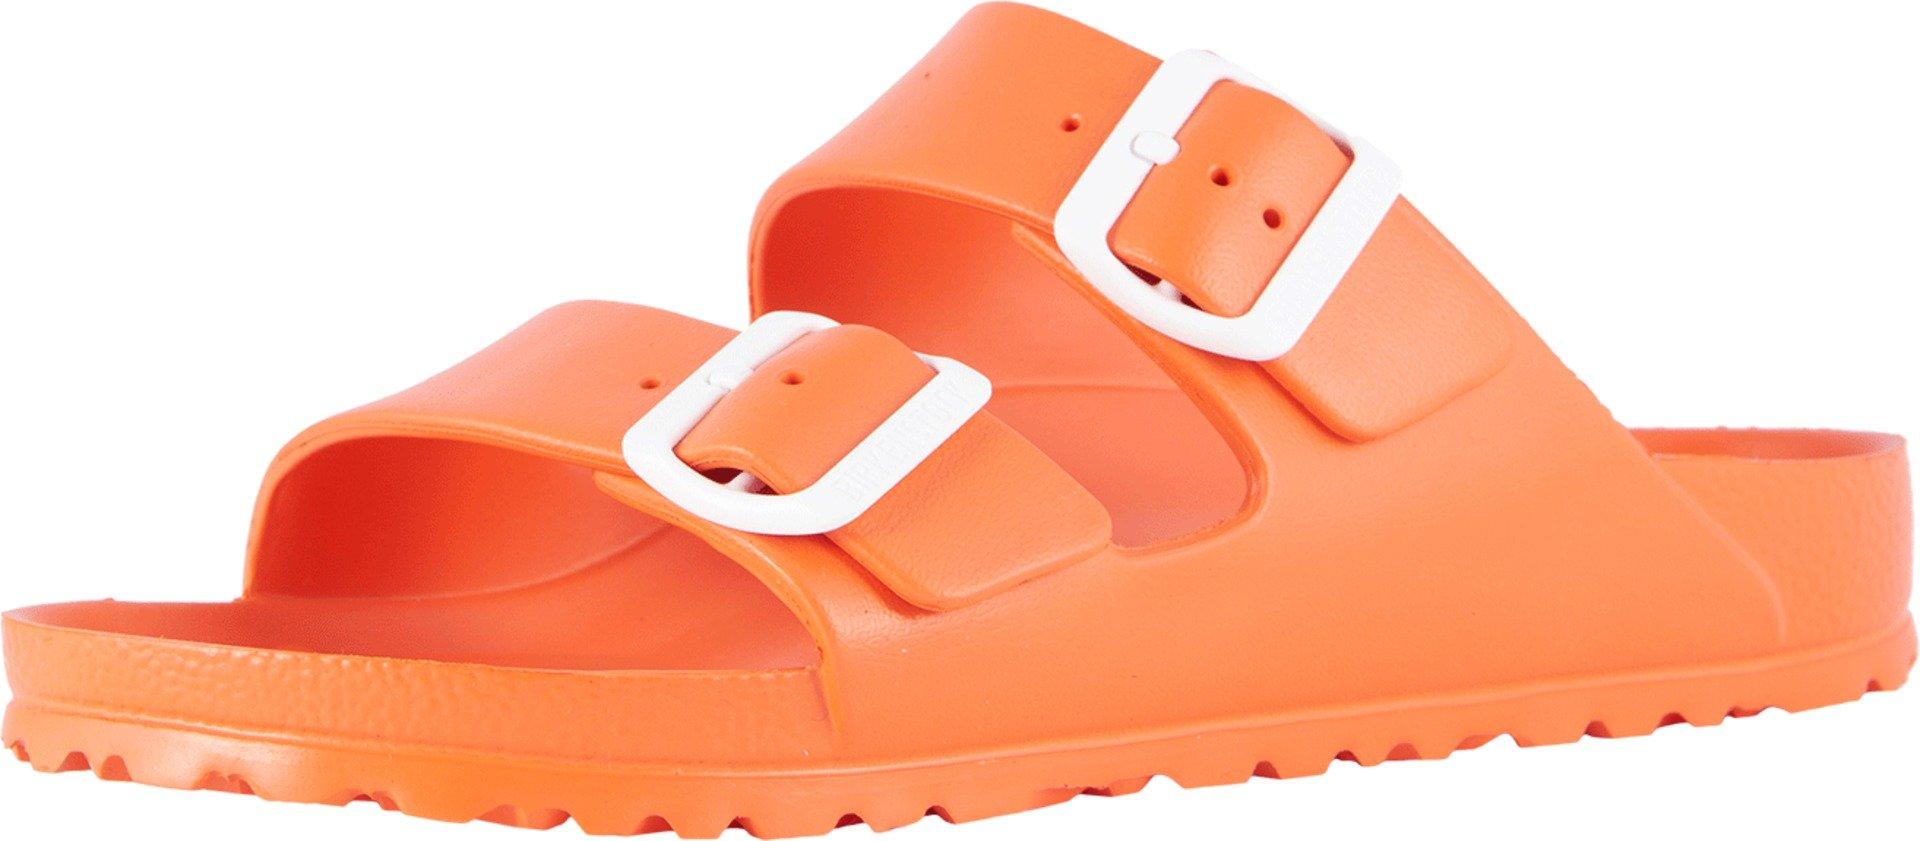 Birkenstock Unisex Arizona Essentials EVA Scuba Coral Sandals - 38 N EU / 7-7.5 2A(N) US by Birkenstock